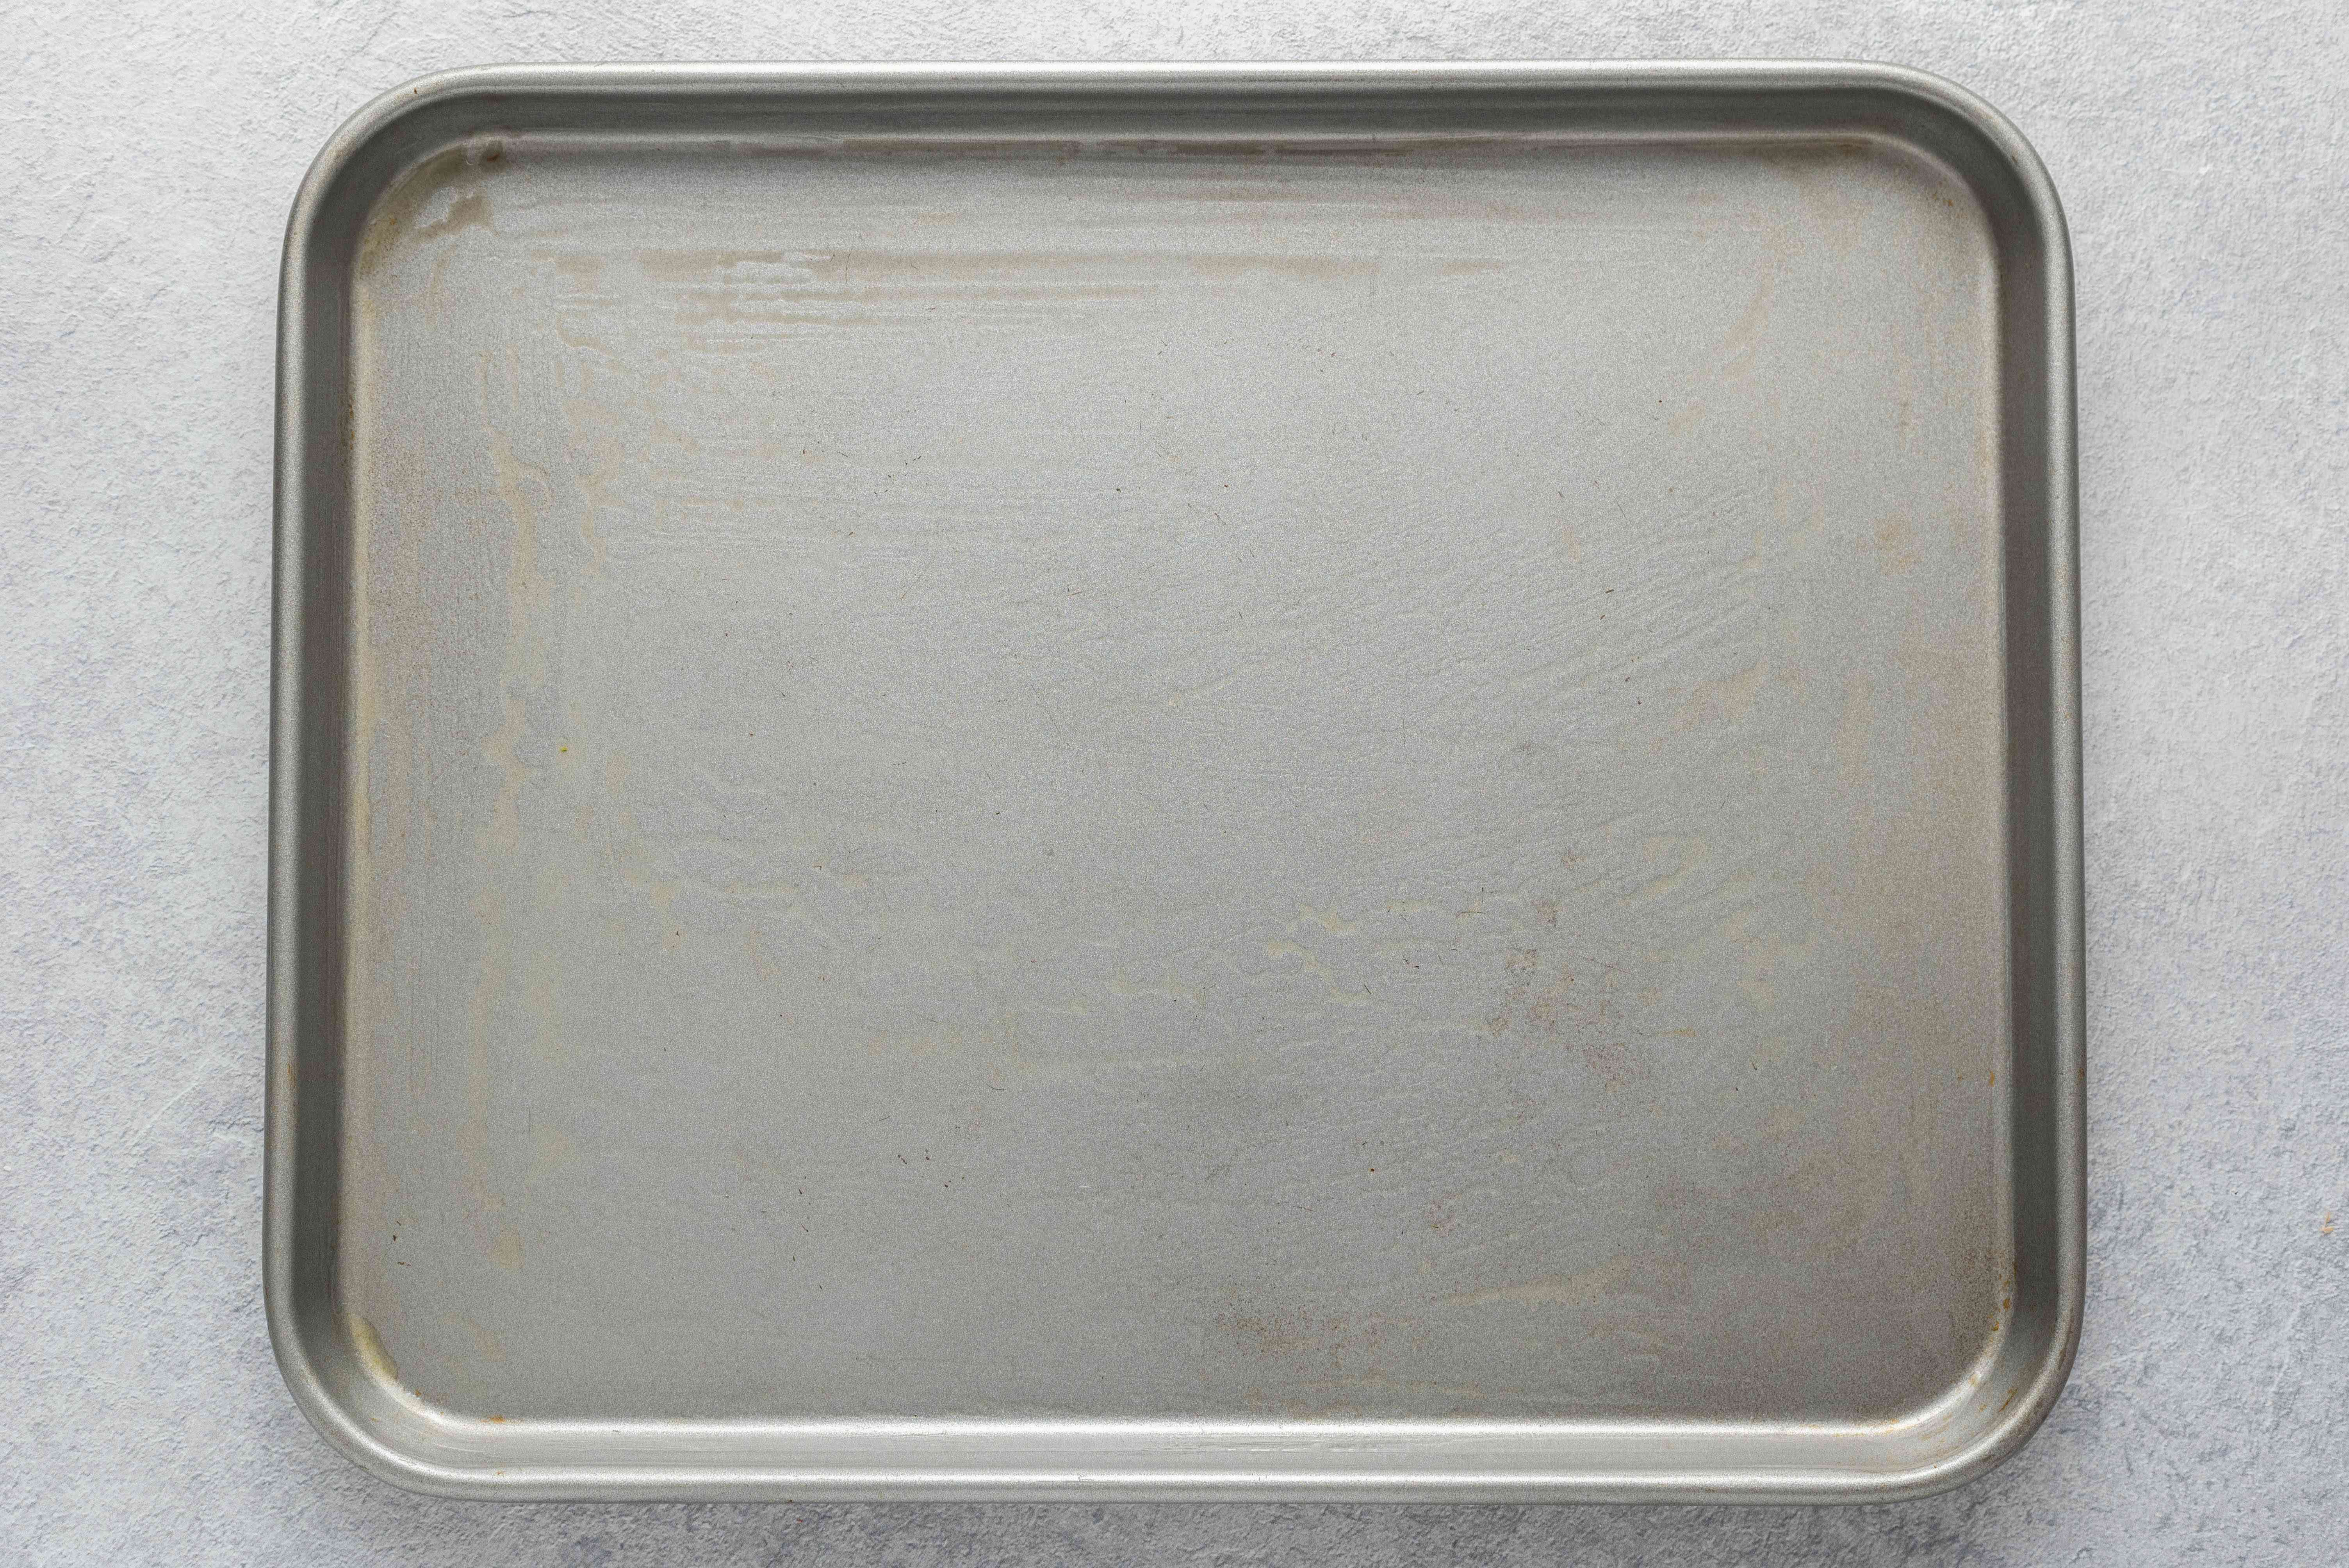 greased baking sheet